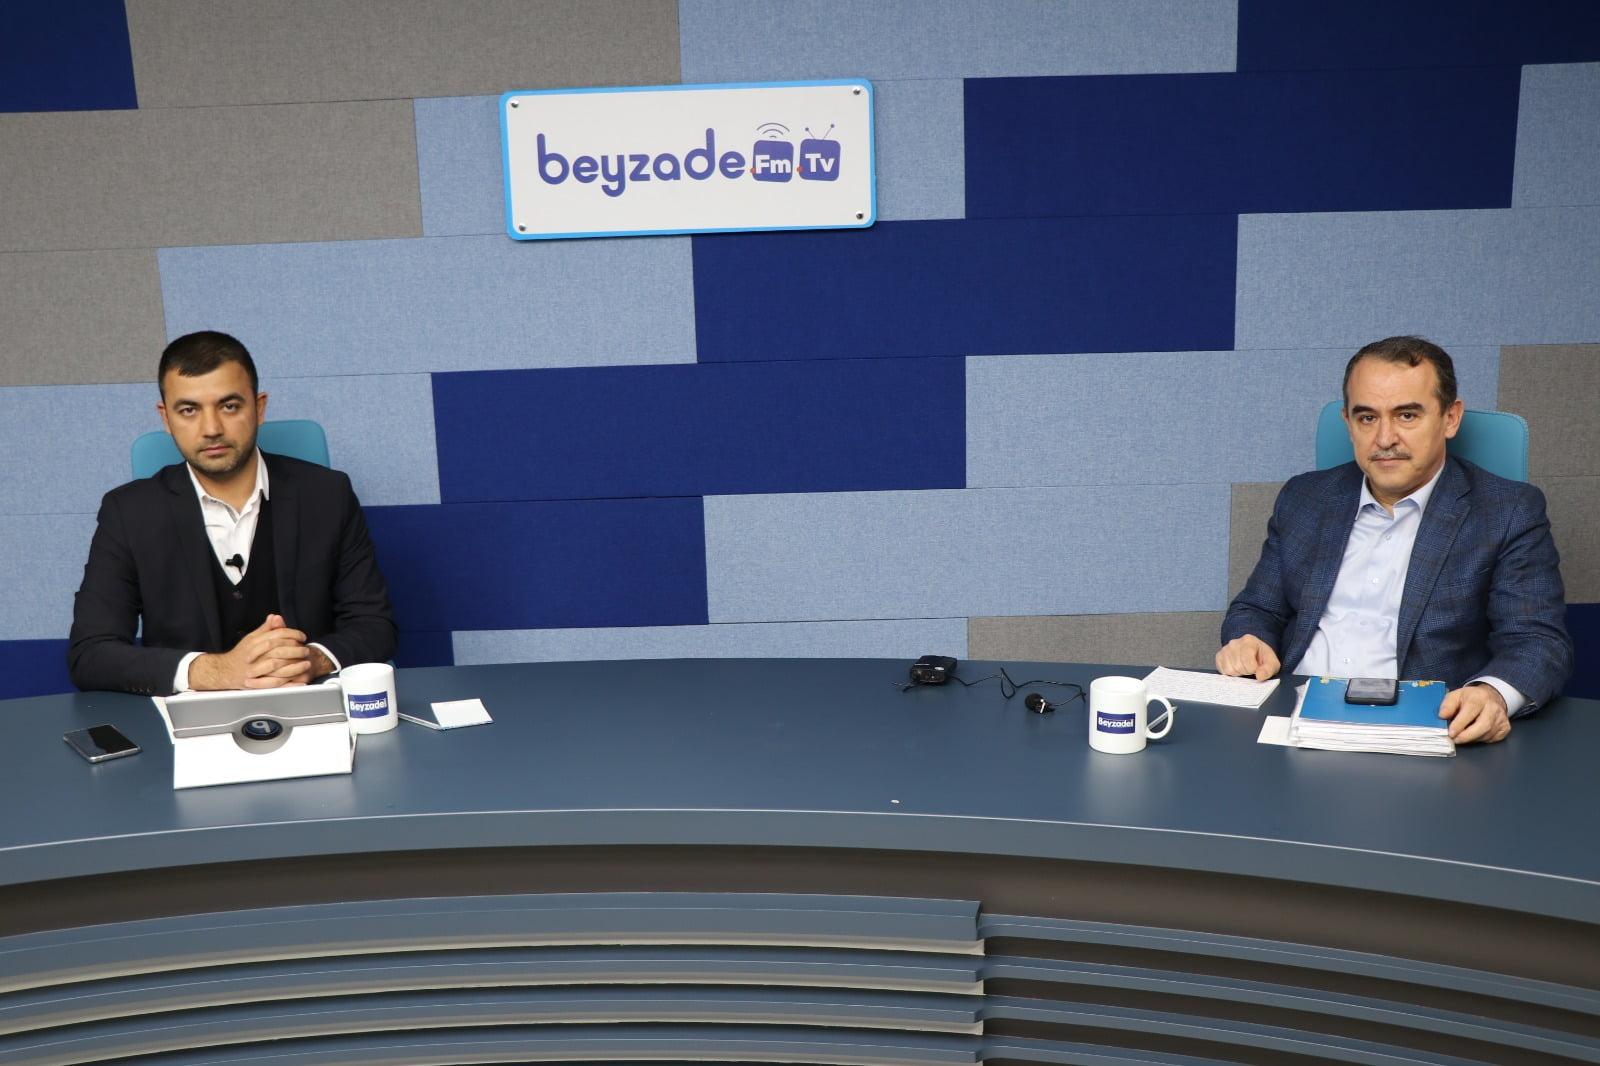 BEYZADE FMTV 2